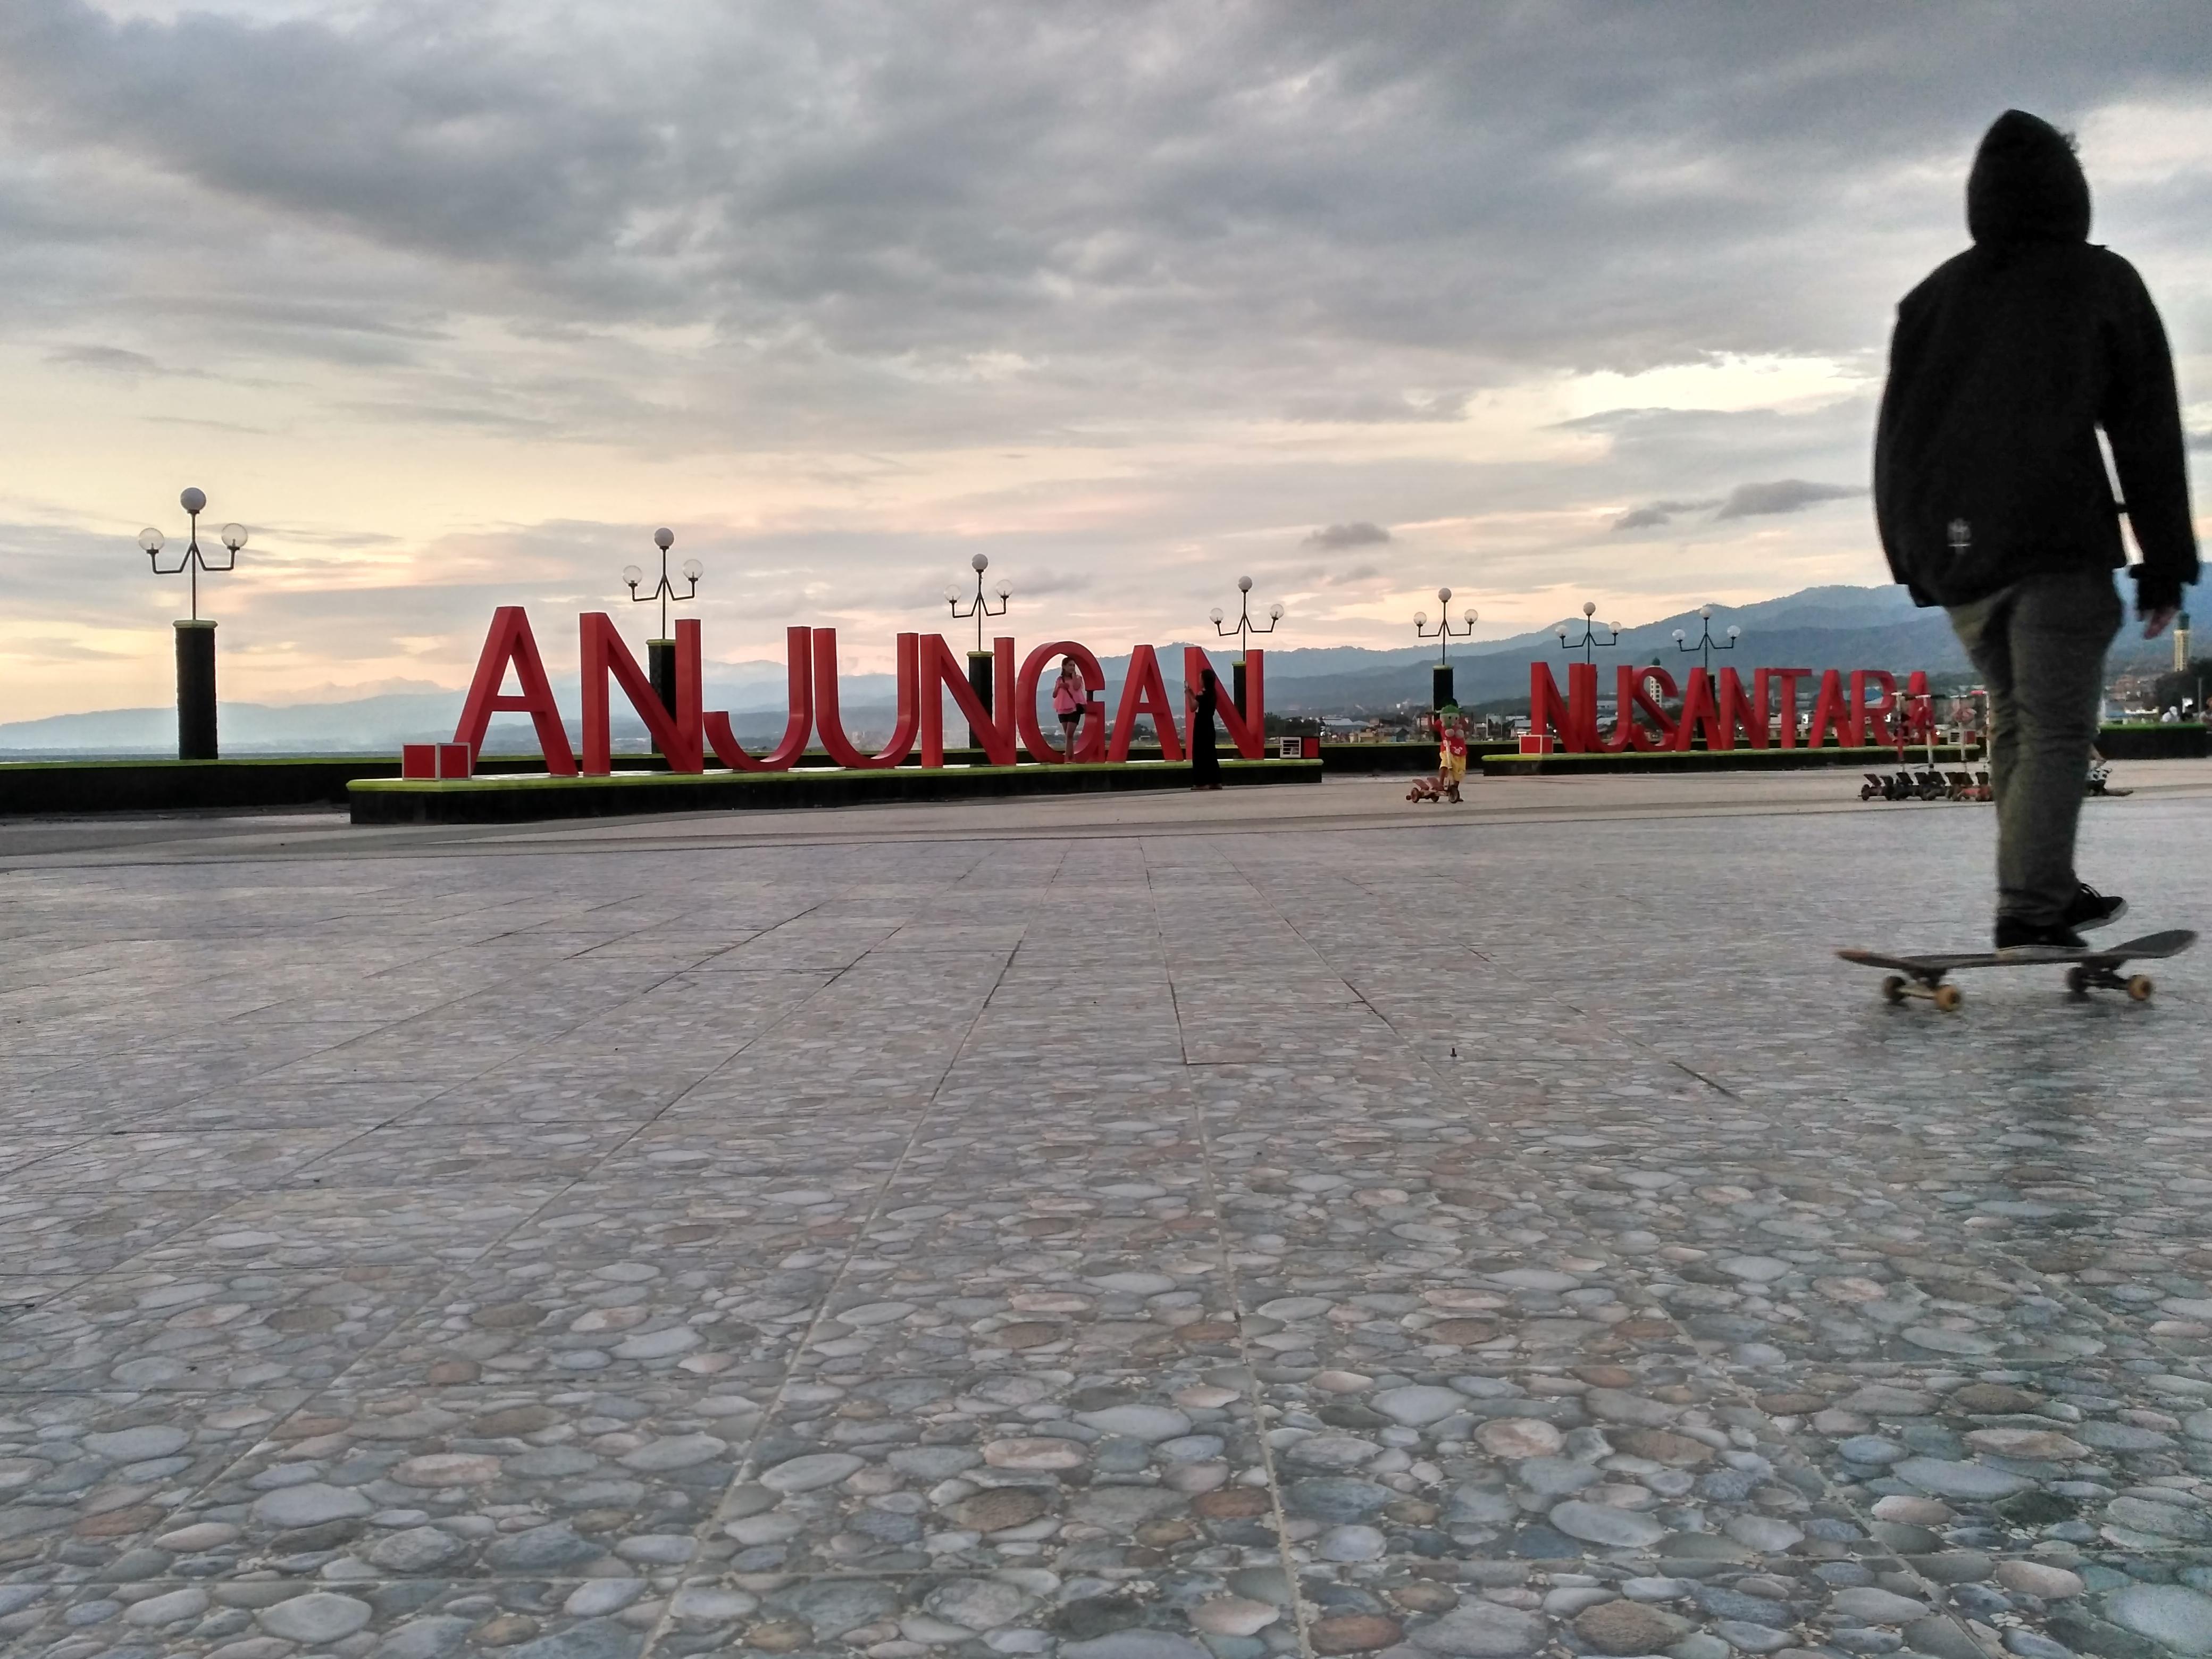 5 Tempat Nongkrong Hits Kota Palu Dipalu Anjungan Nusantara Lokasi